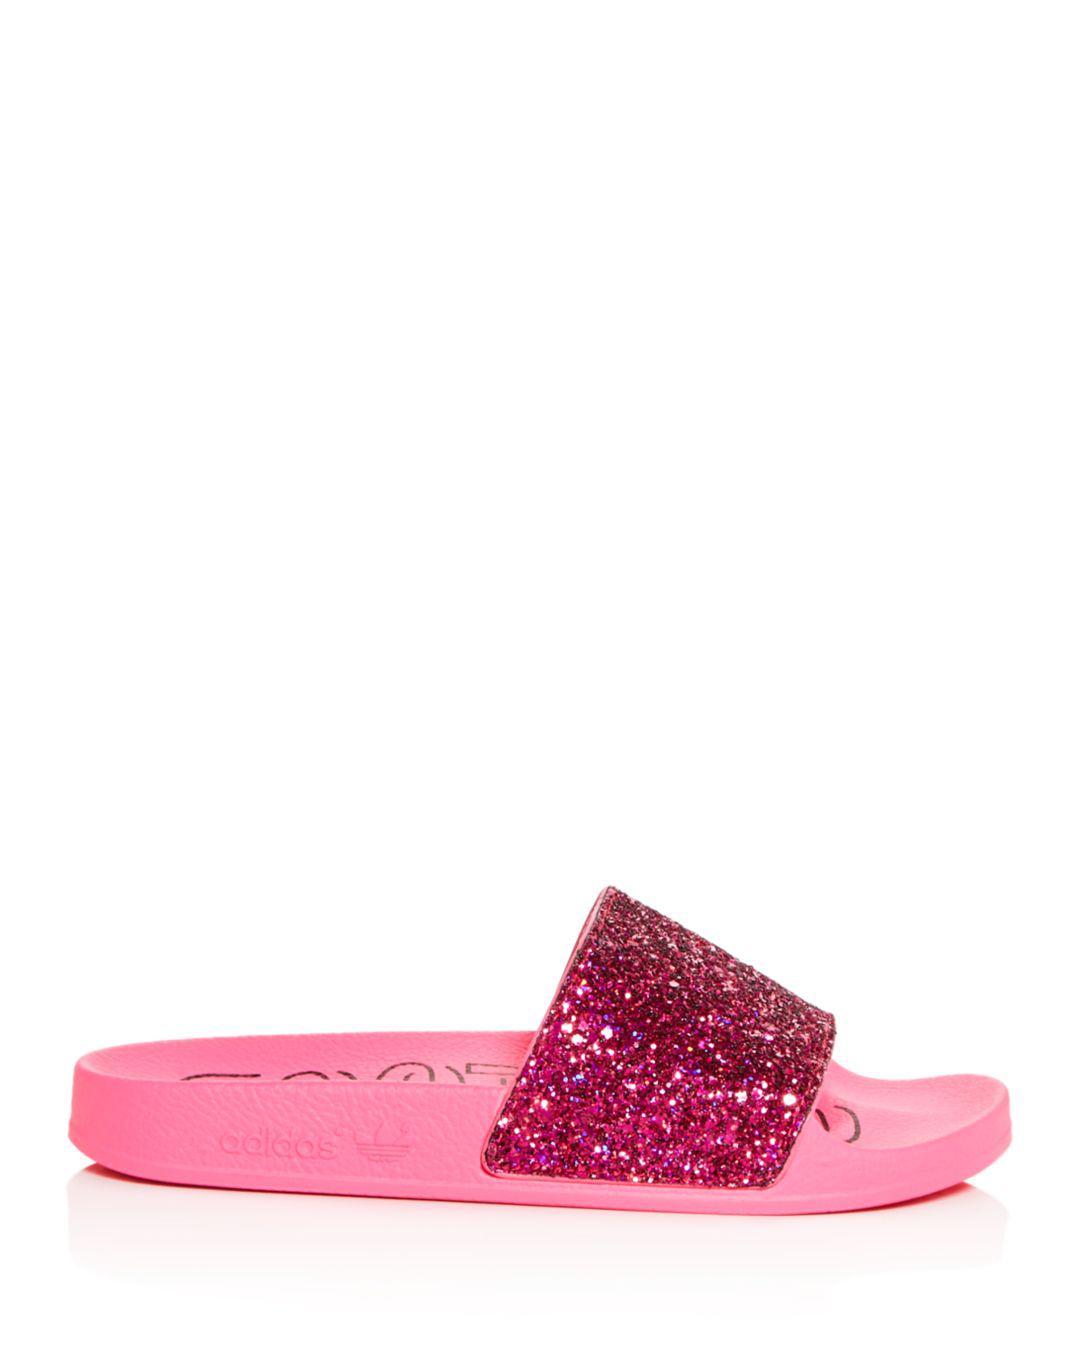 adidas Women s Adilette Glitter Slide Sandals in Pink - Lyst ed080084128